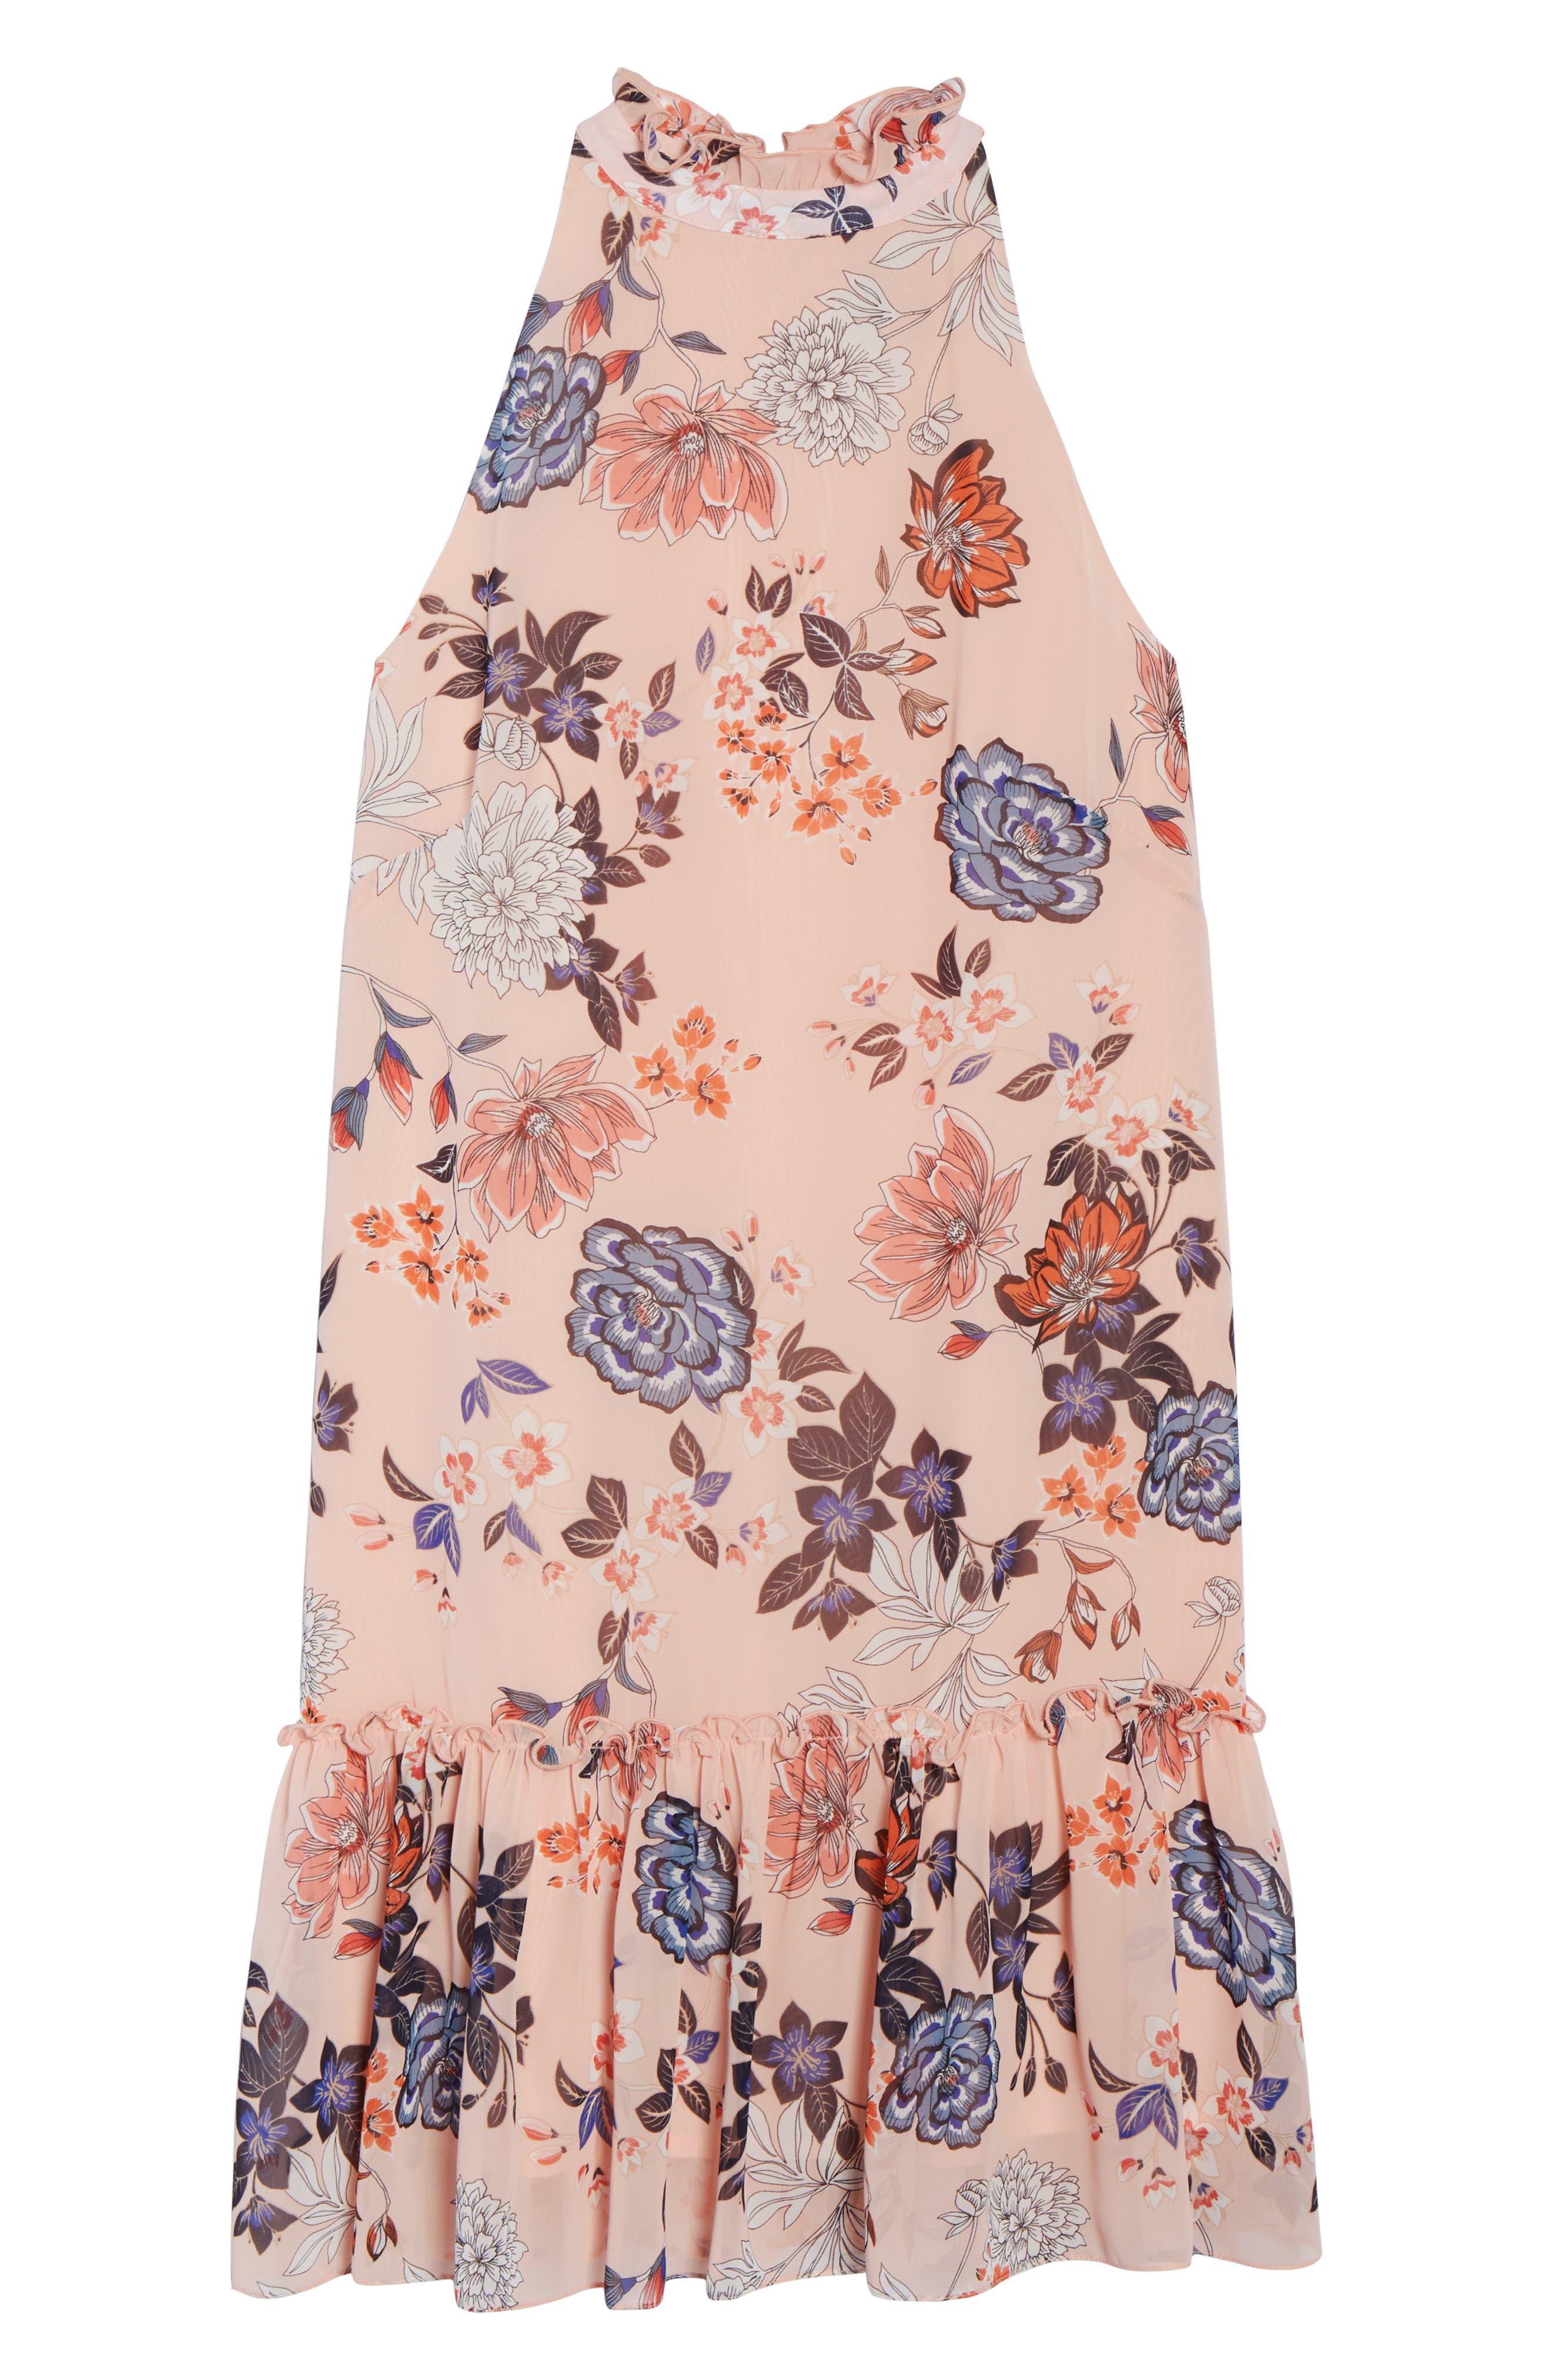 Floral Ruffle Neck Chiffon Shift Dress,                             Alternate thumbnail 7, color,                             BLUSH